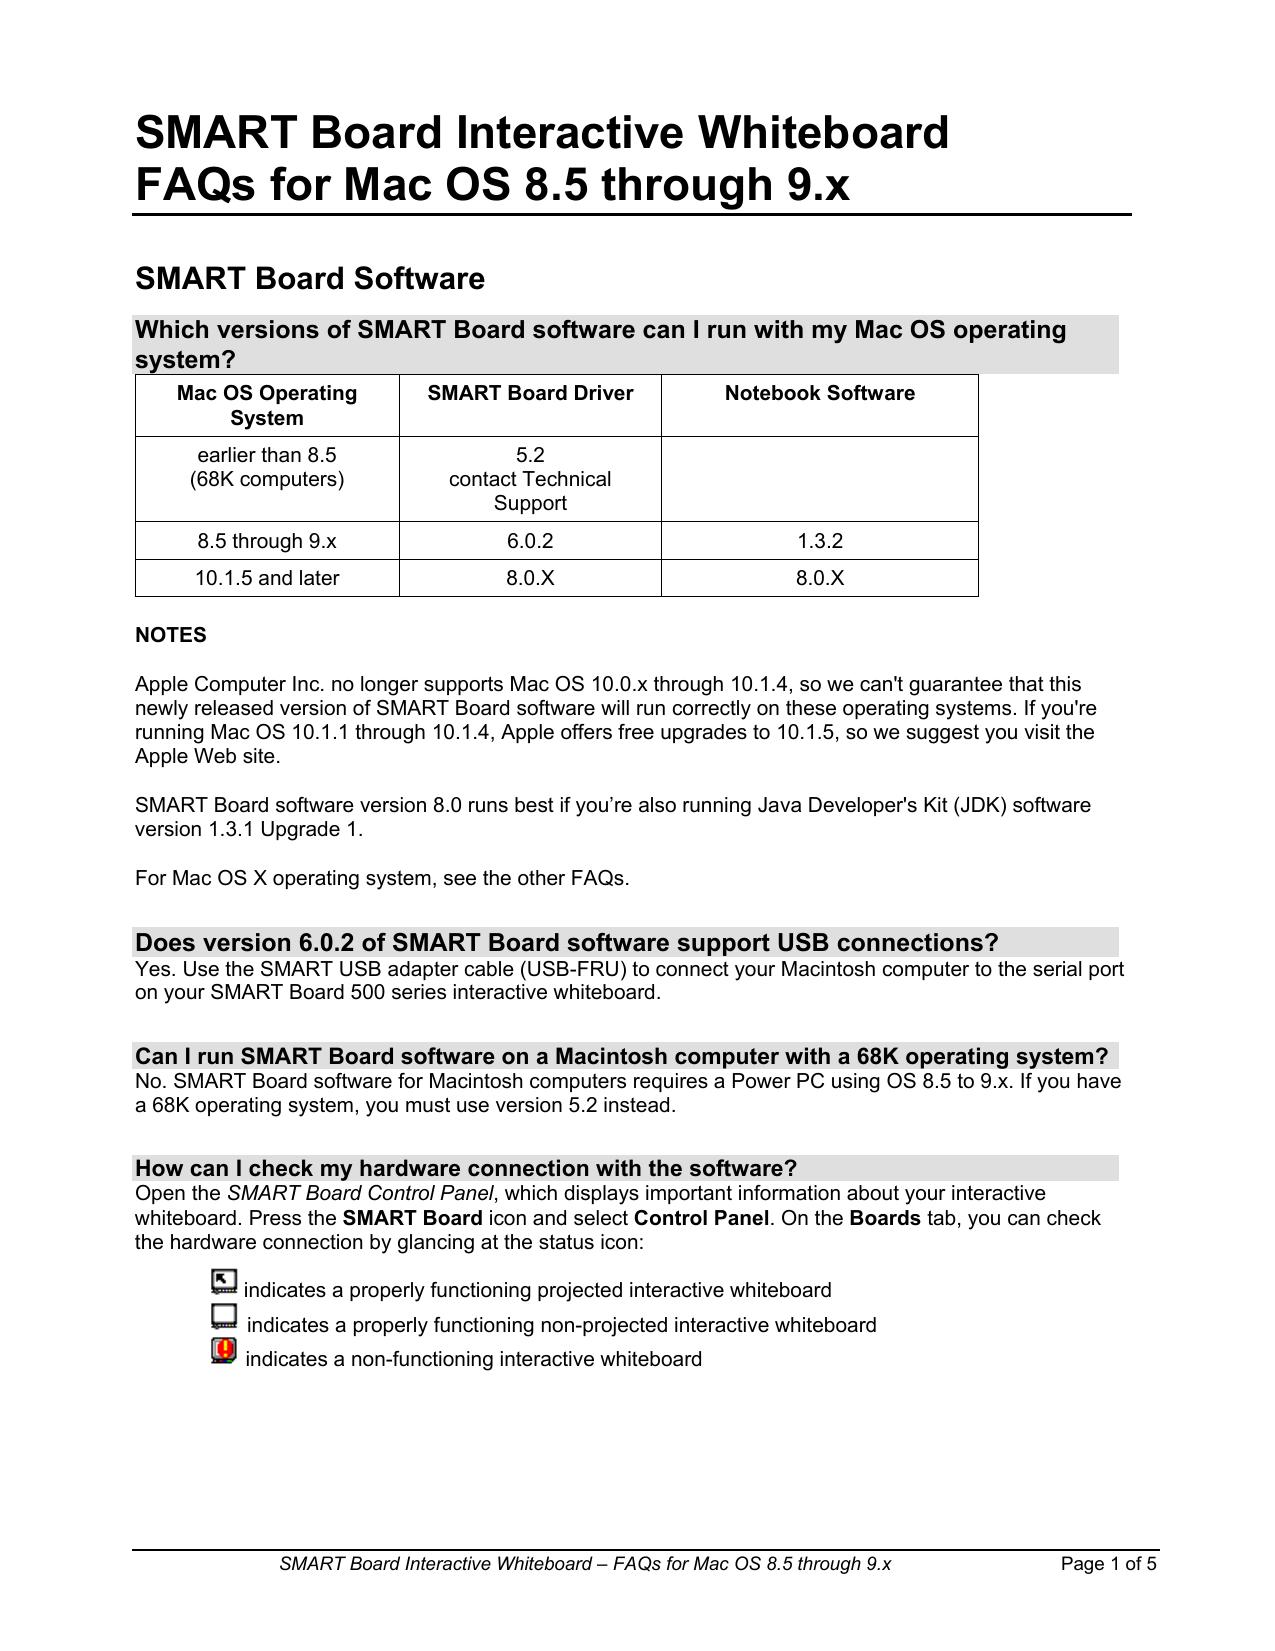 SMART Board for Mac OS 8 5 - 9 x FAQs   manualzz com